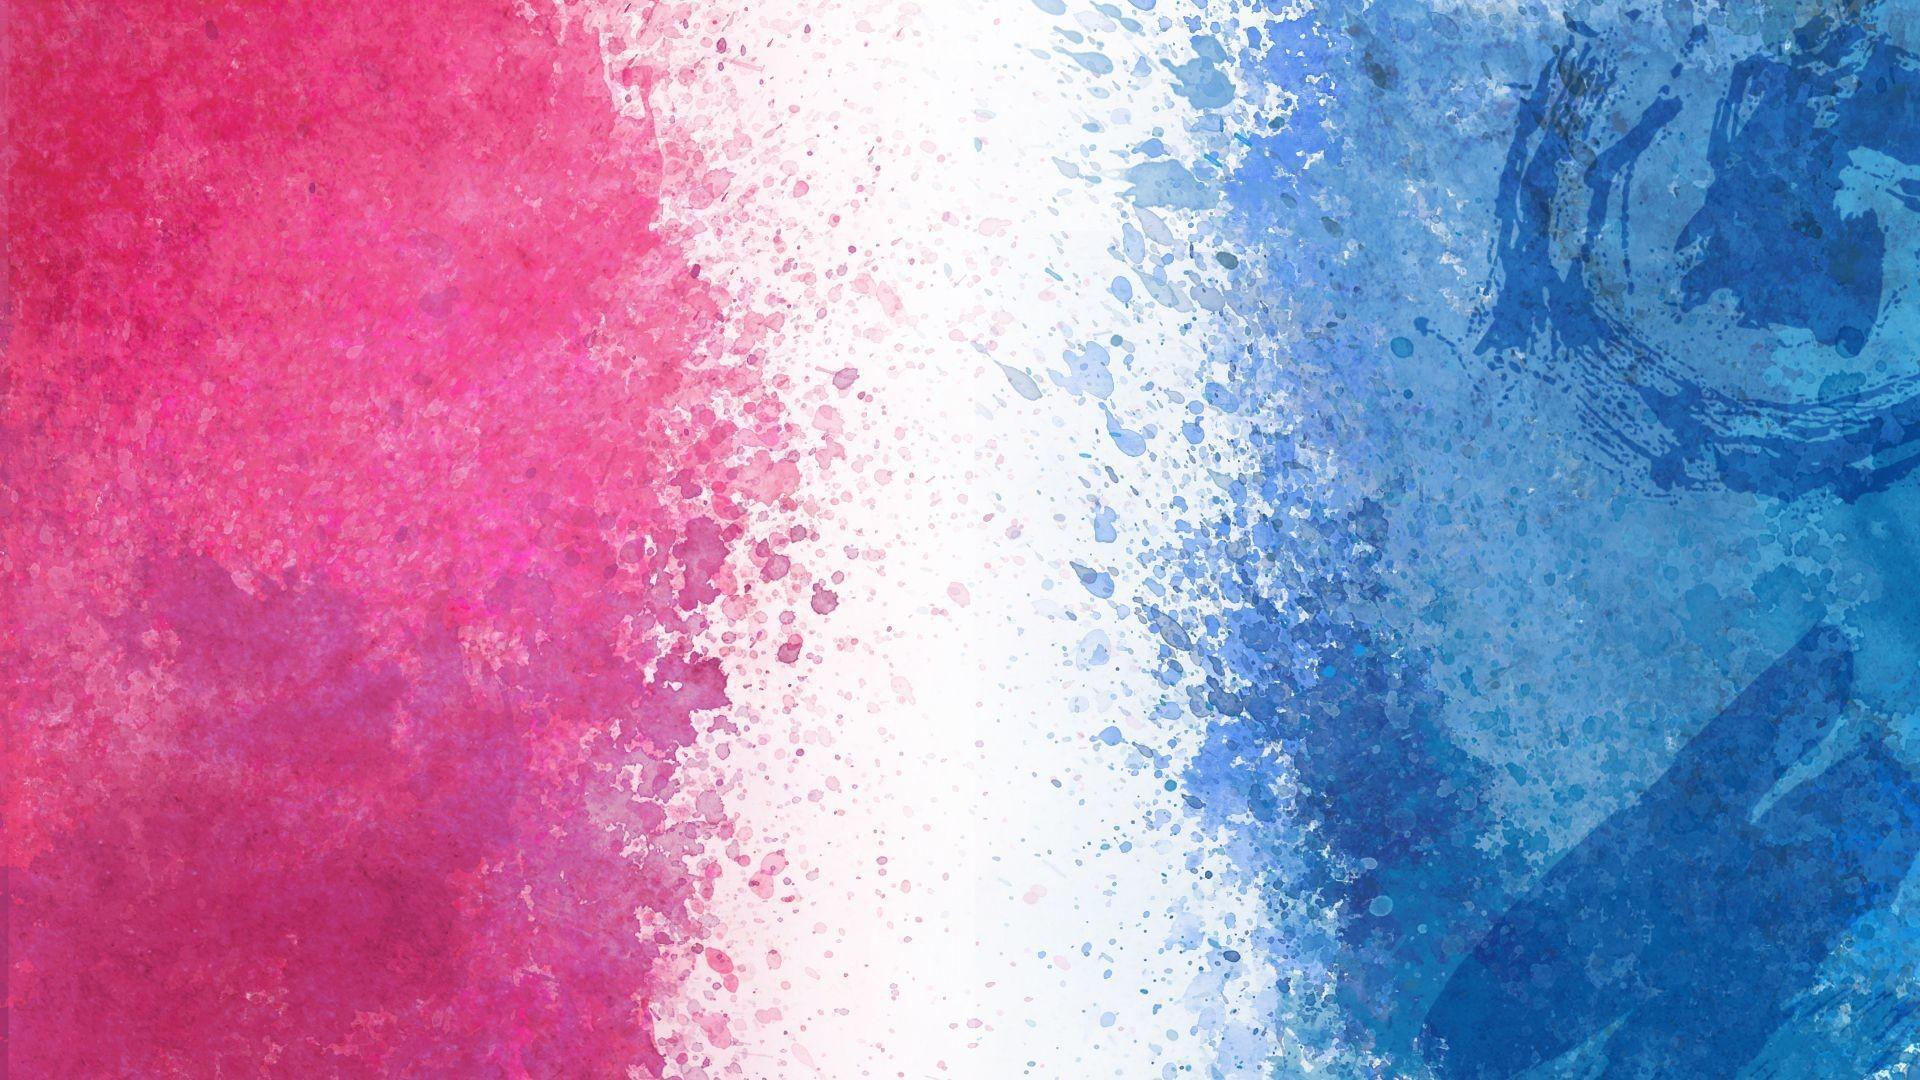 Res: 1920x1080, Colors Splash HD desktop wallpaper Widescreen High Definition